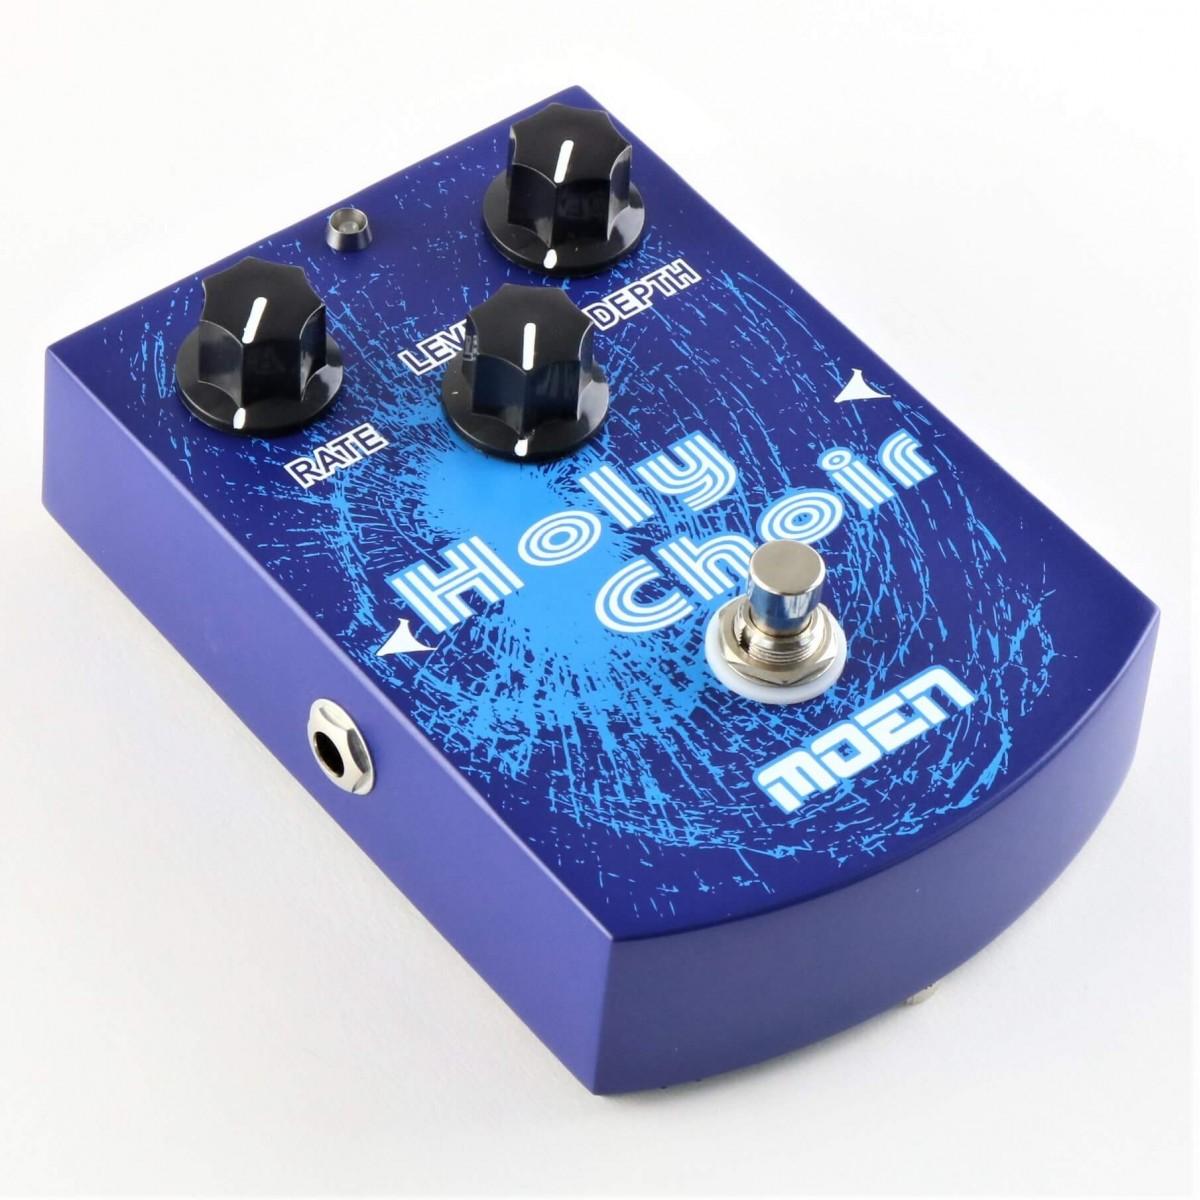 D'addario Exl115 3d Pack – 3set